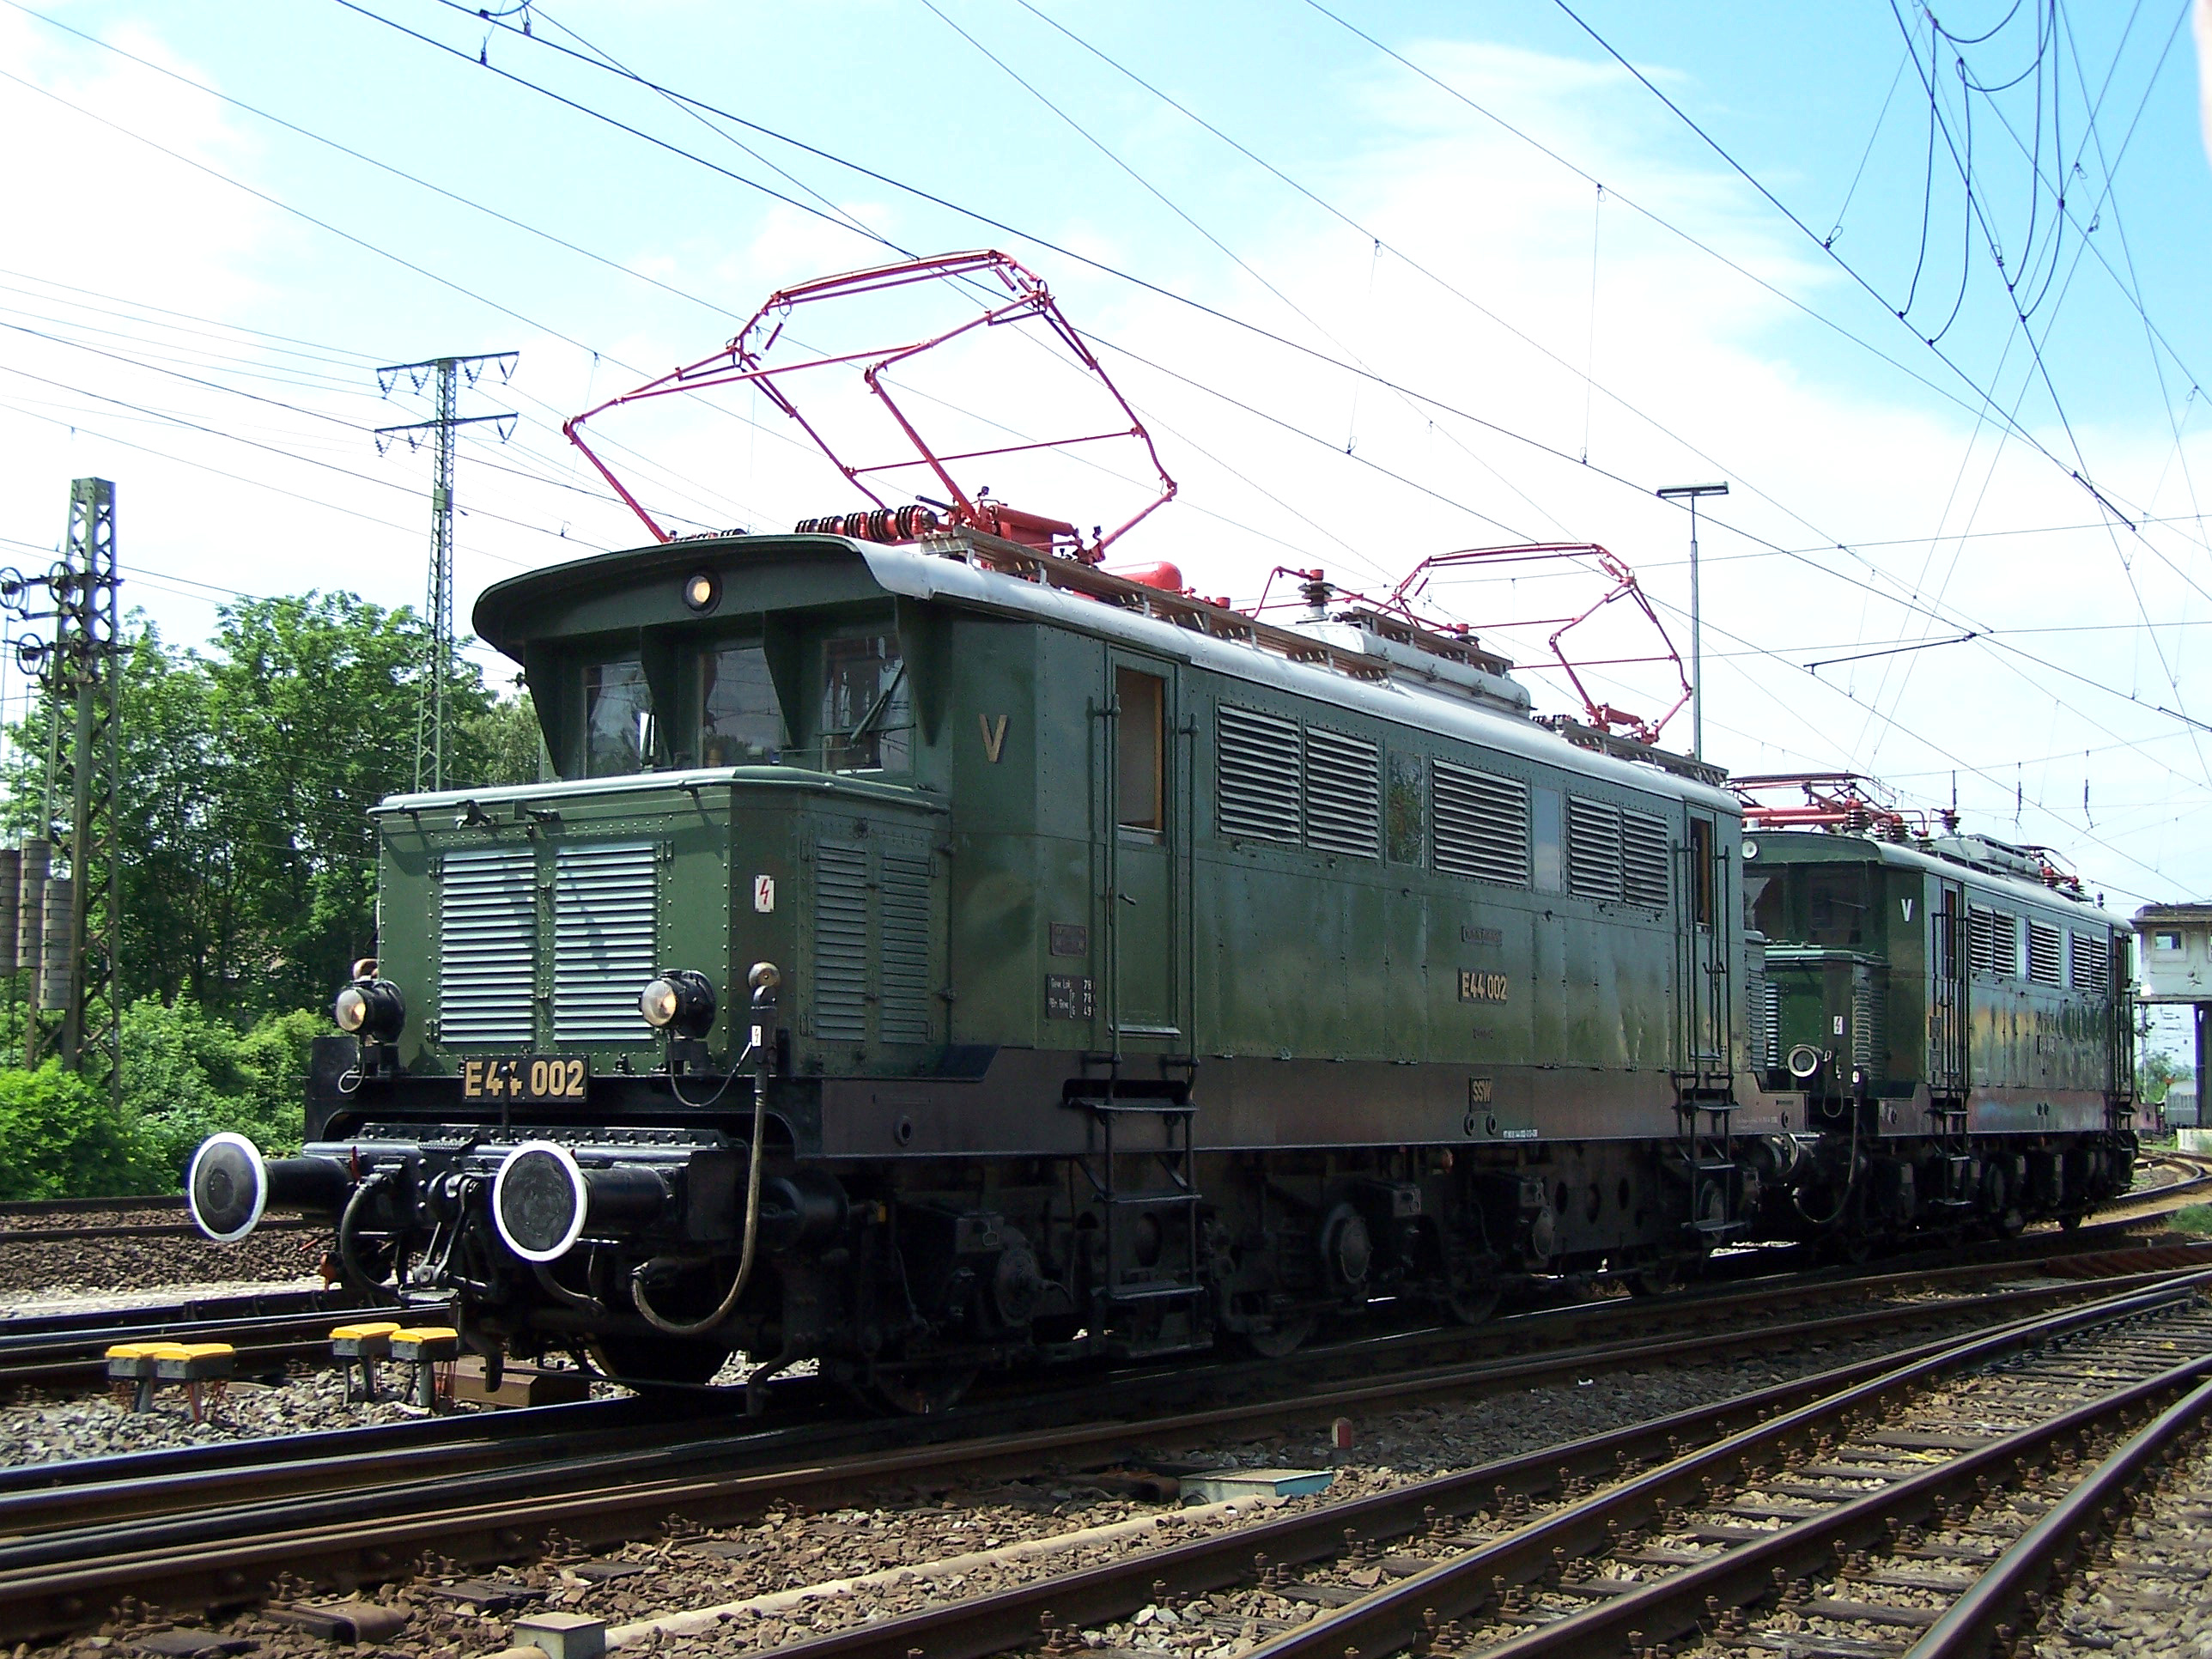 E44 002 ja E44 046, Koblenz-Lützel 2.6.2012. Kuva: Urmelbeauftragter/Wikimedia Commons CC-BY-SA 3.0